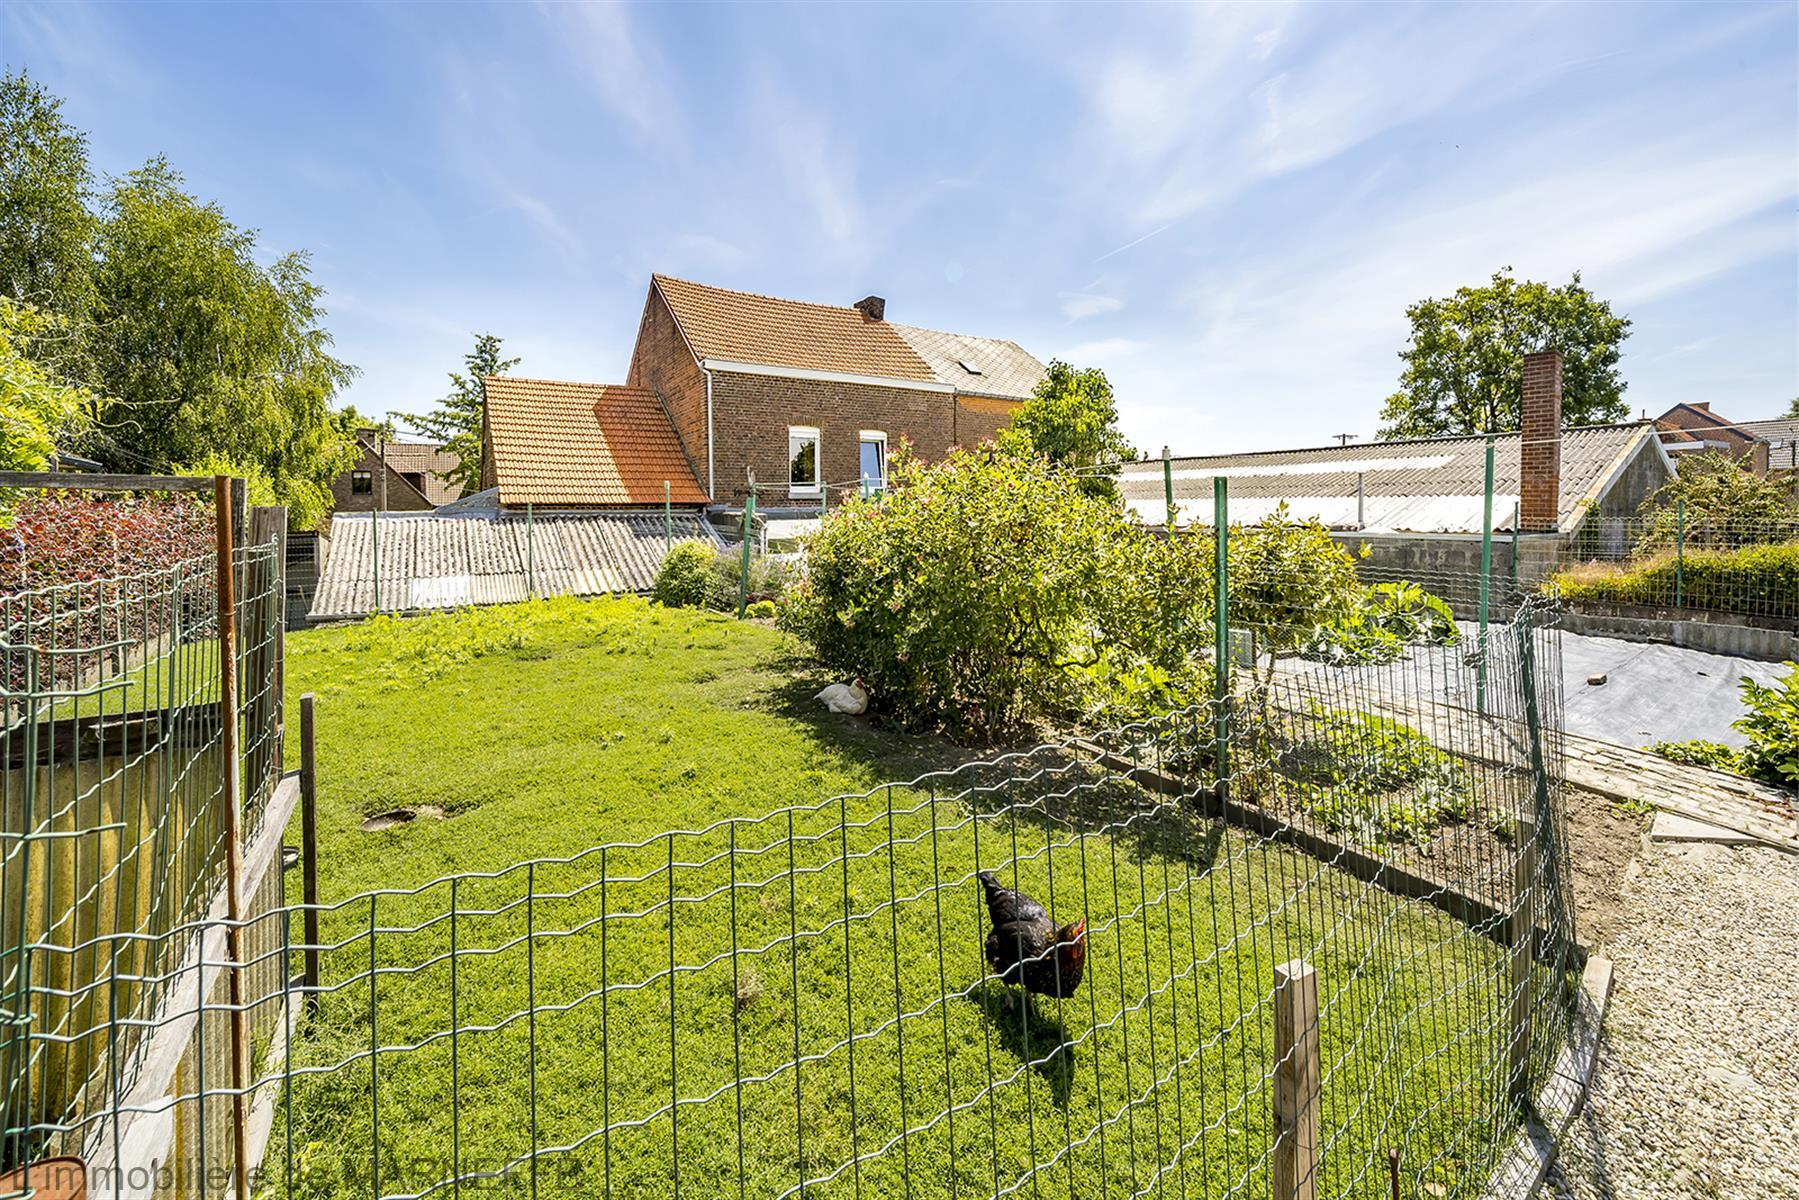 Maison - Remicourt - #3801531-19